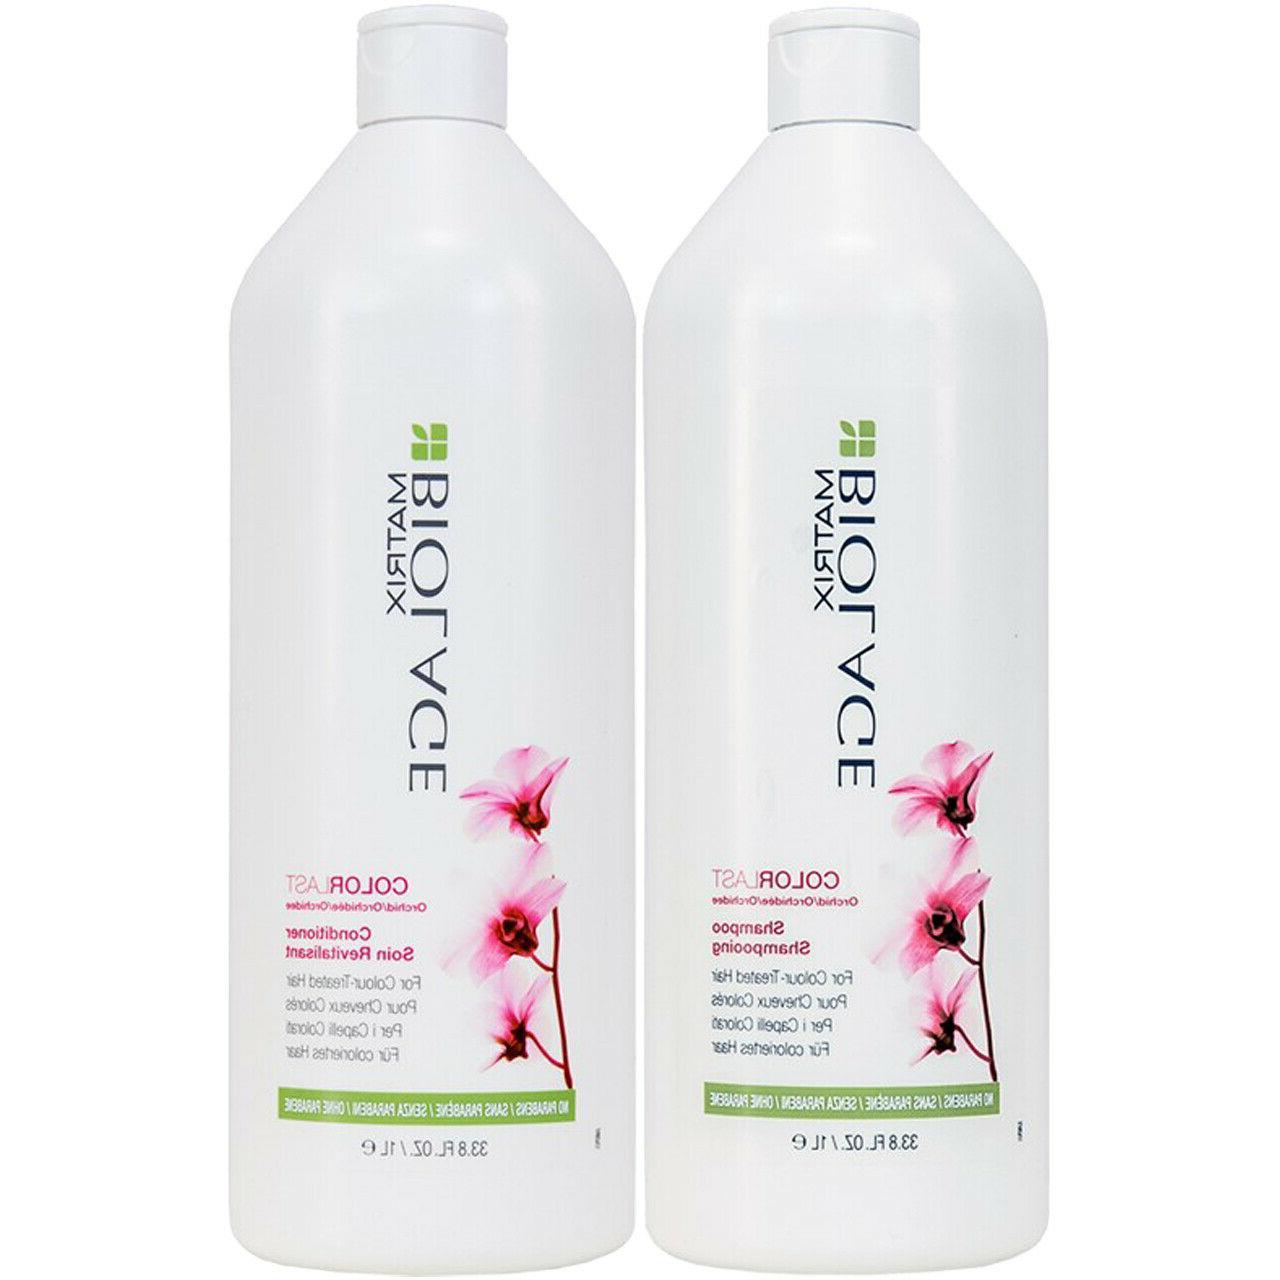 biolage color last shampoo and conditioner 33